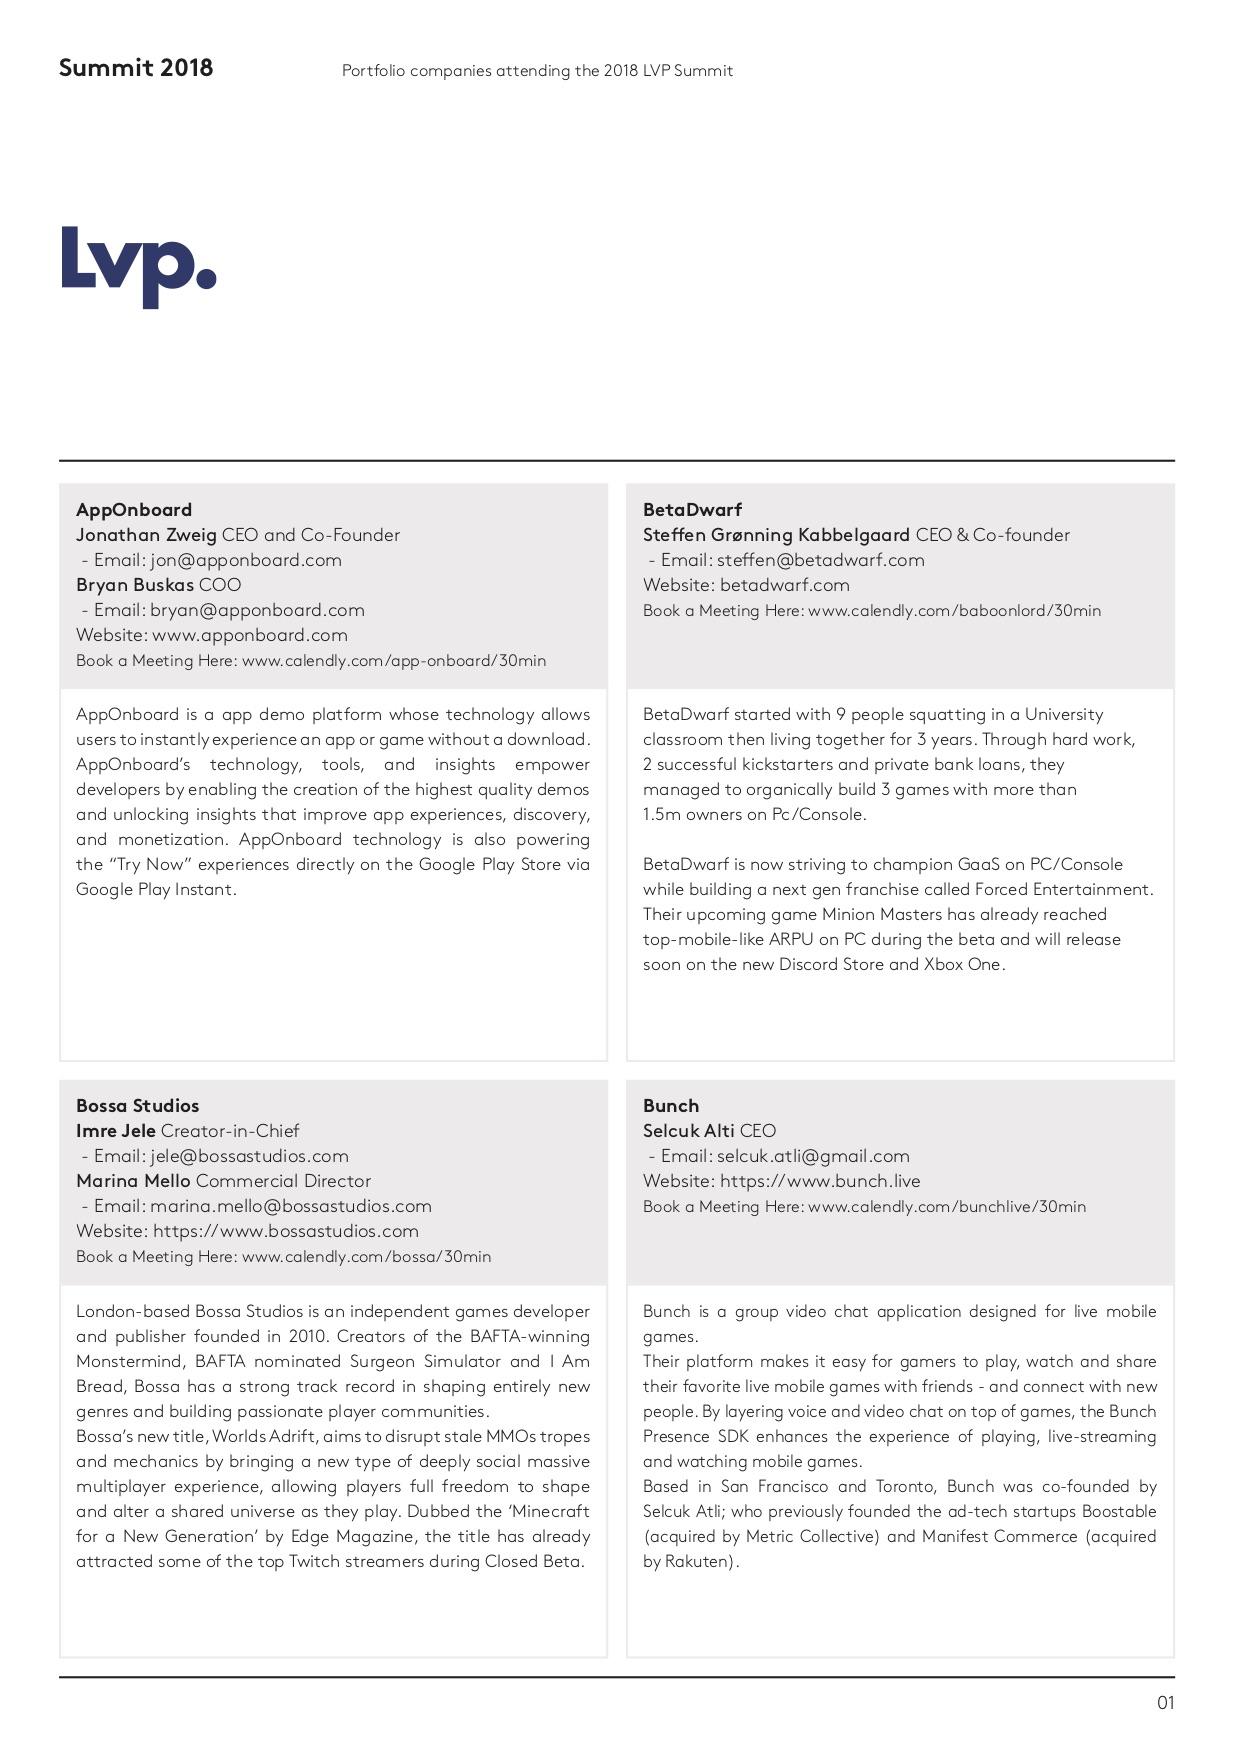 LVP_Summit2018_Speed Dating.jpg